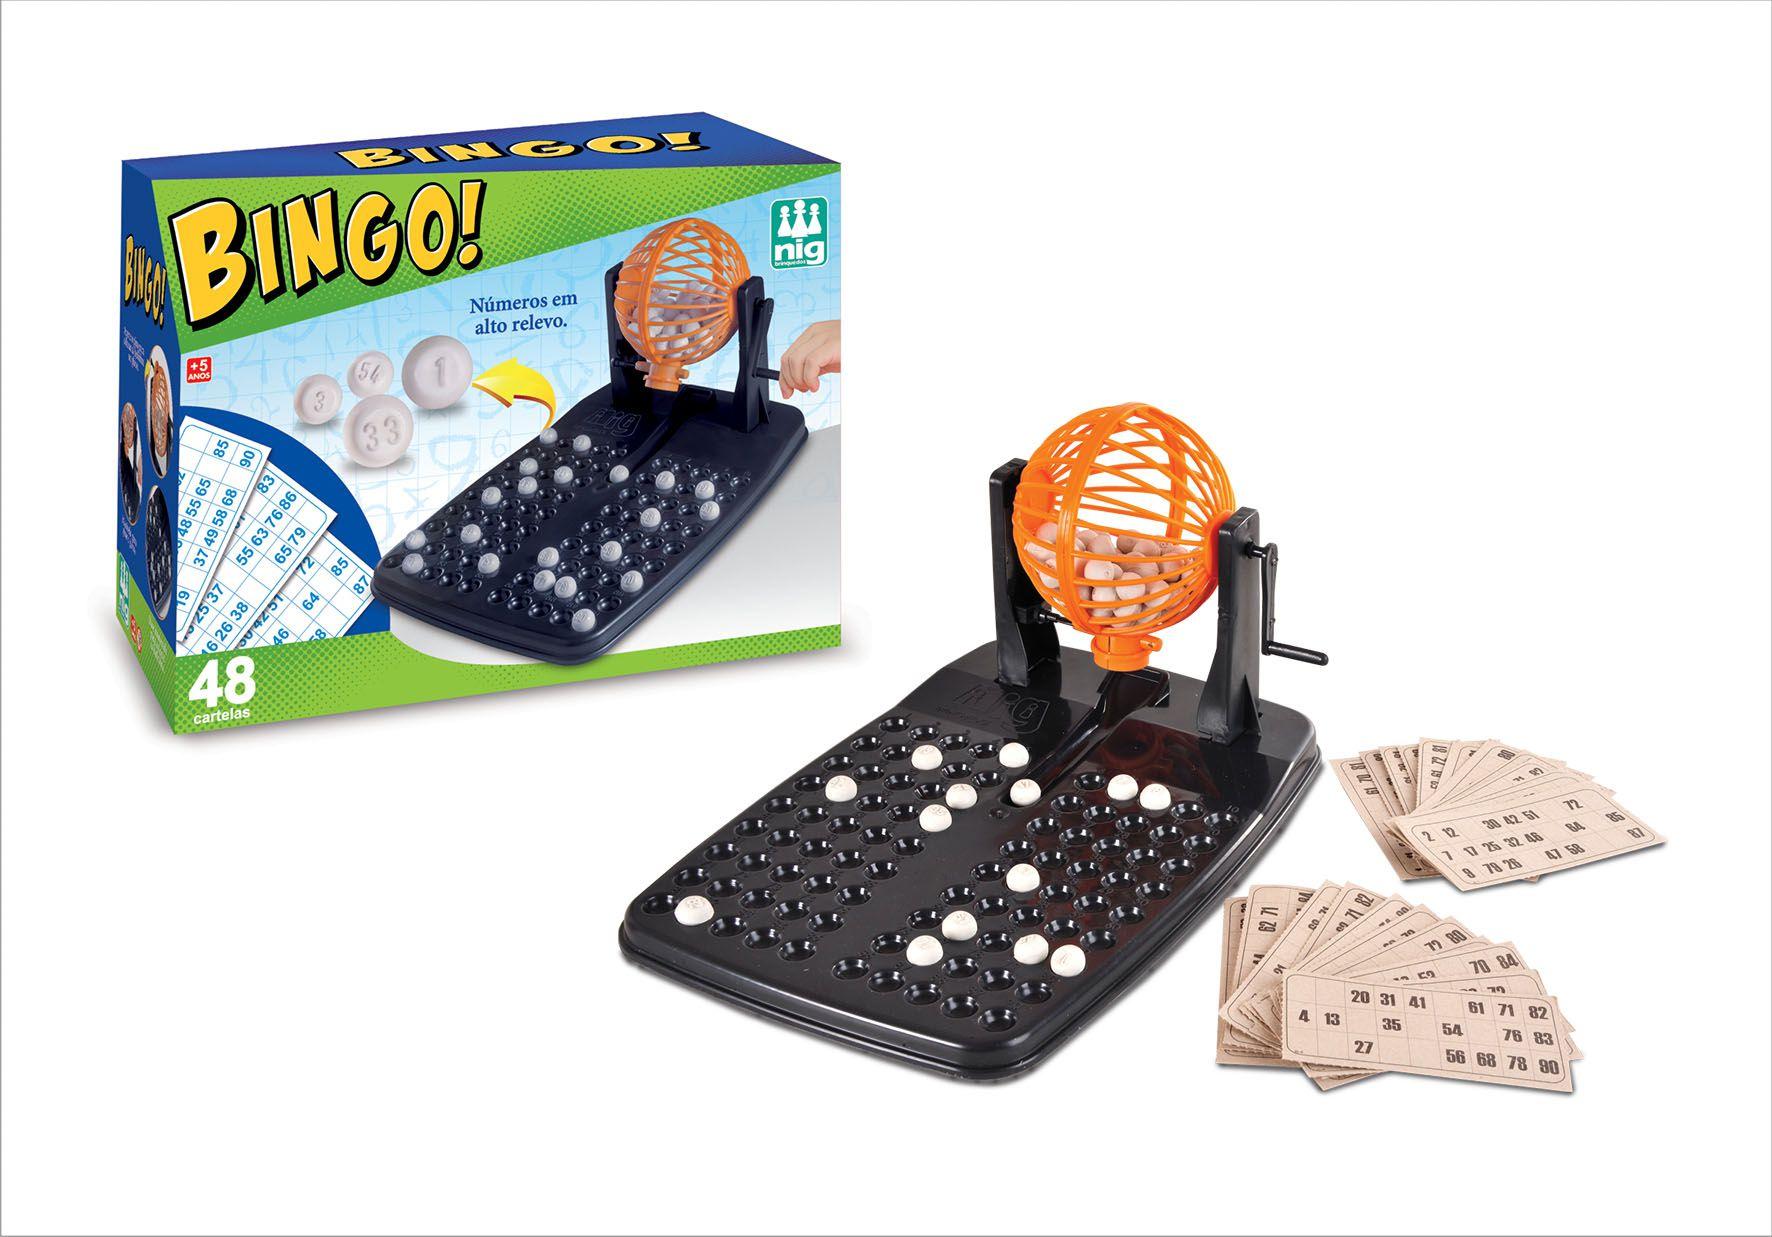 Jogo Bingo - Nig - 48 Cartelas